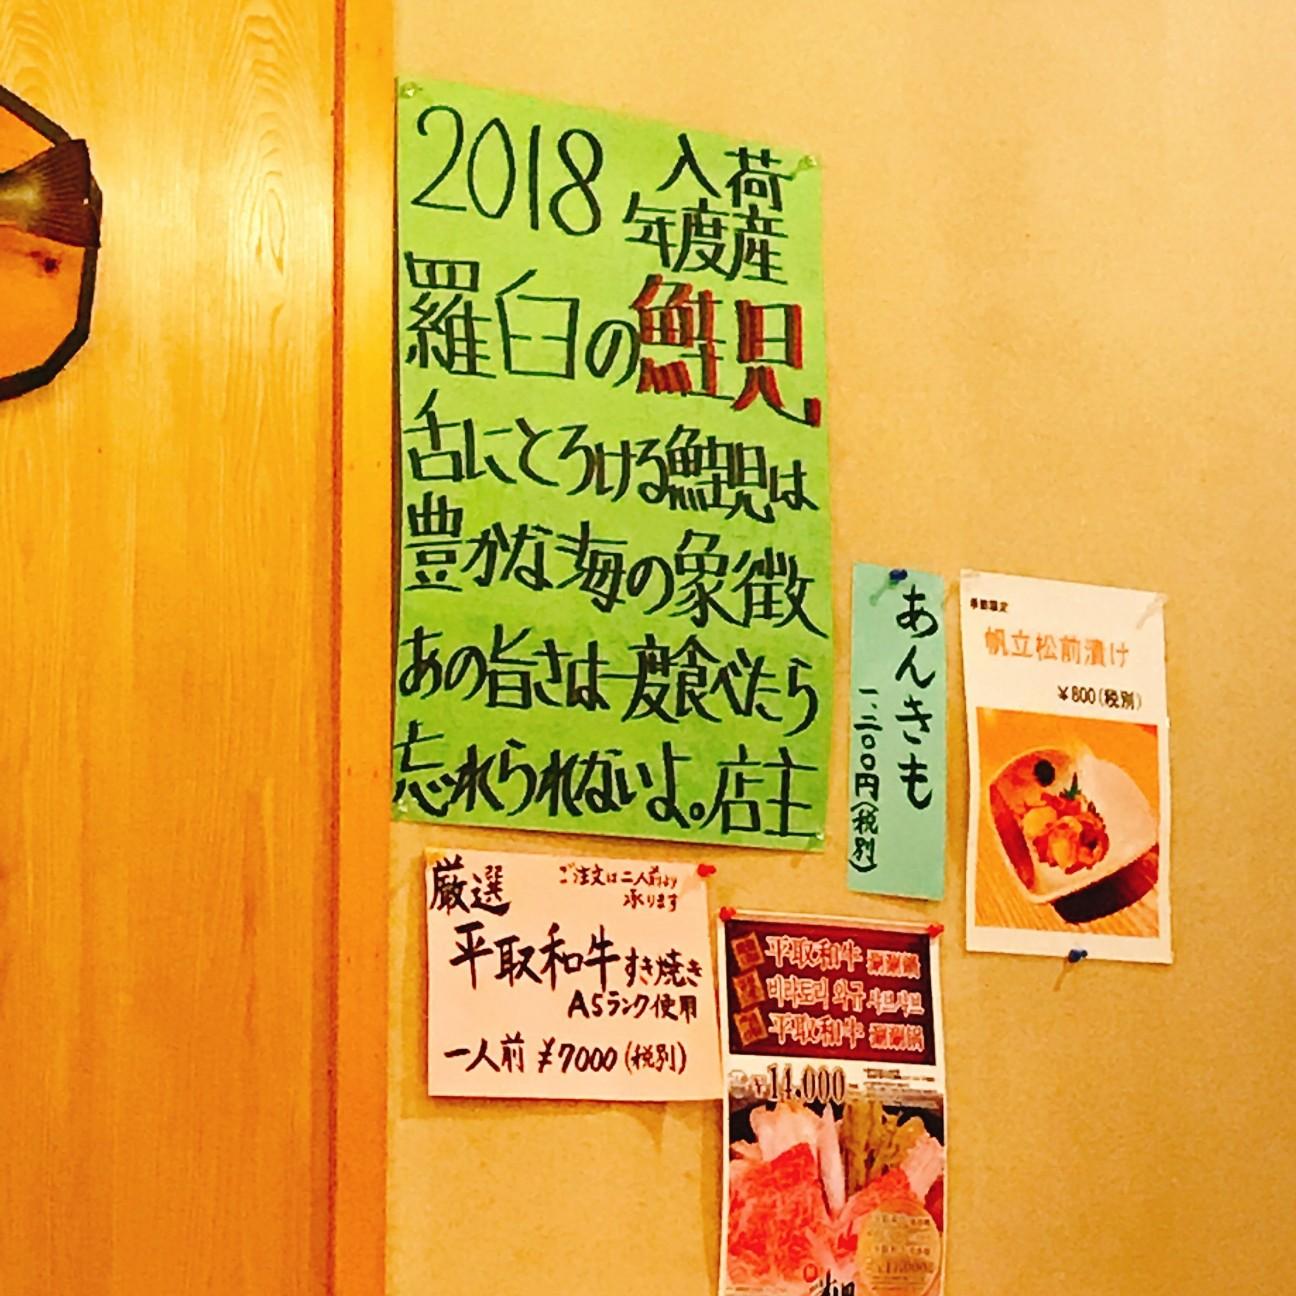 f:id:tt-suzukiit:20190509224125j:image